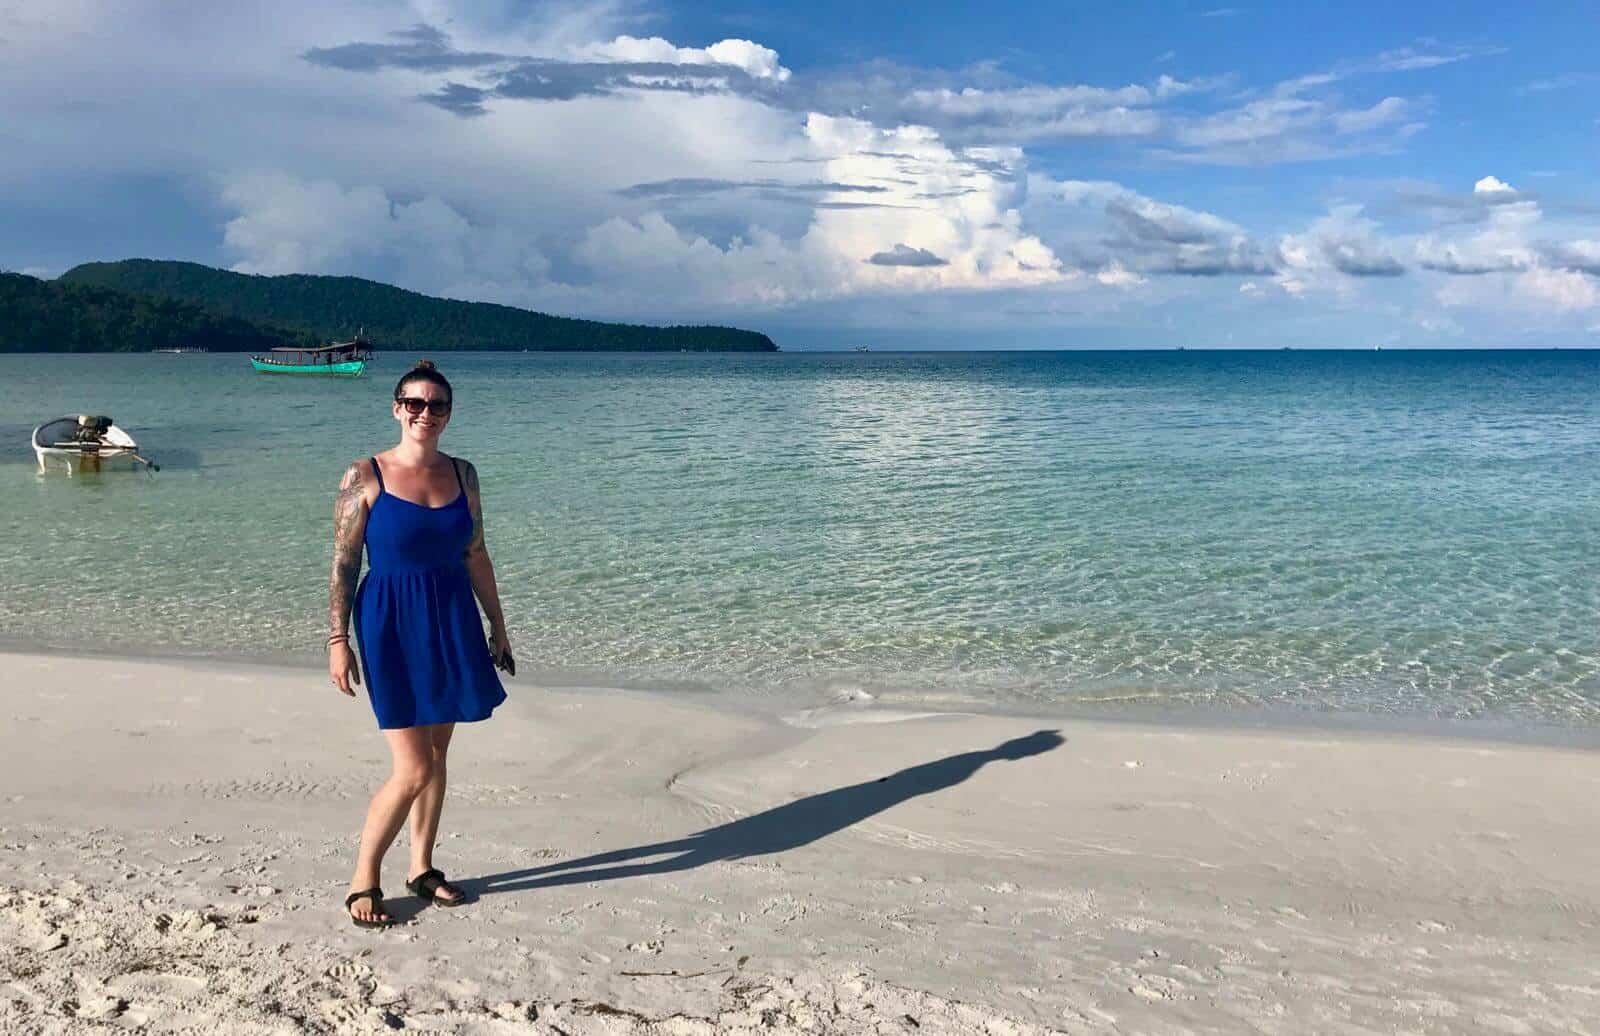 betternotstop Hannah Koh Rong Sanloem beach time blue dress